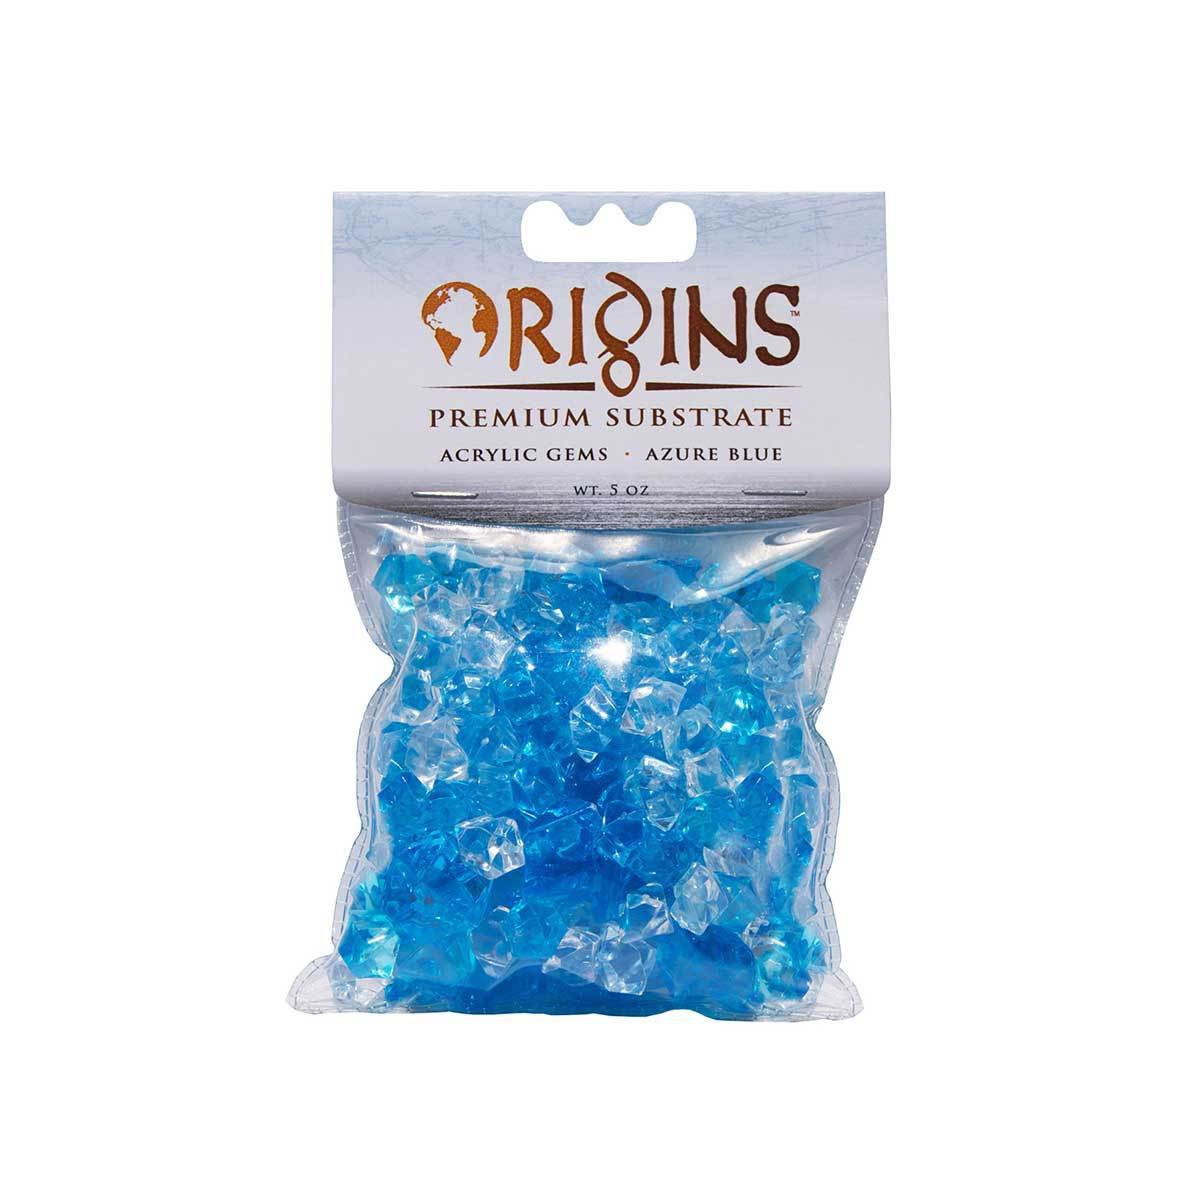 BioBubble Acrylic Gems 5 ounce bag (Glacier Blue)